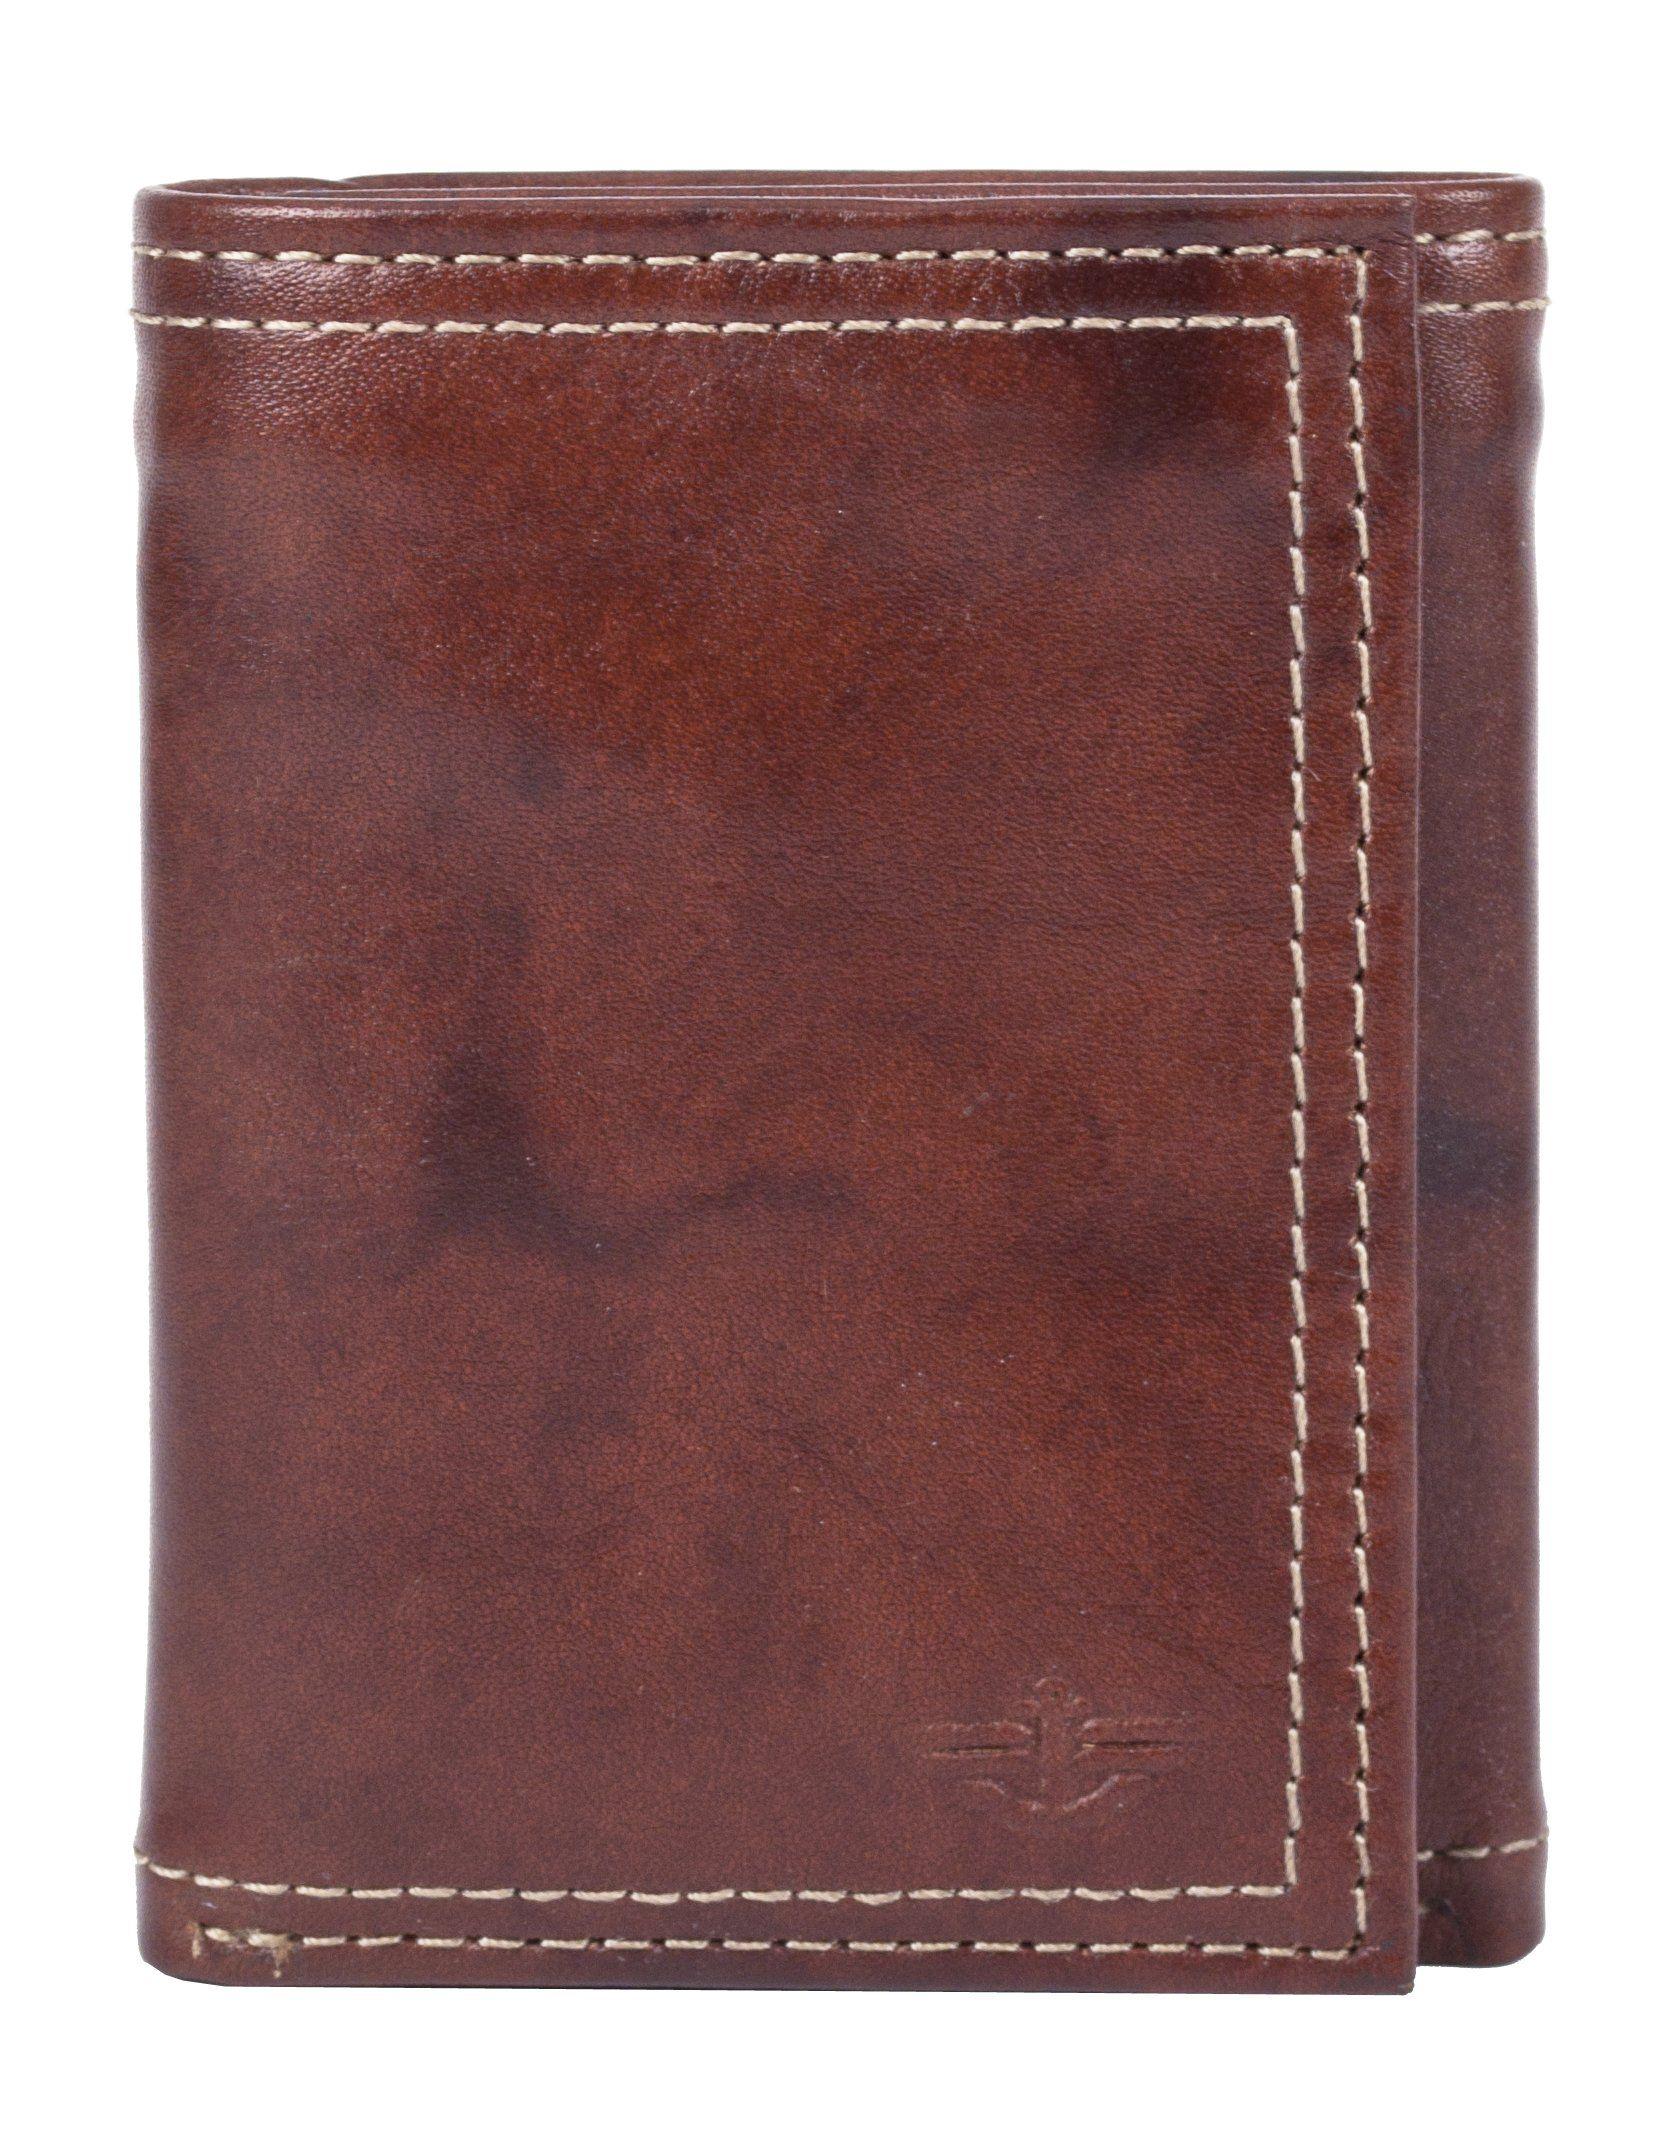 Dockers Men's Leather Interior Zipper Trifold Wallet